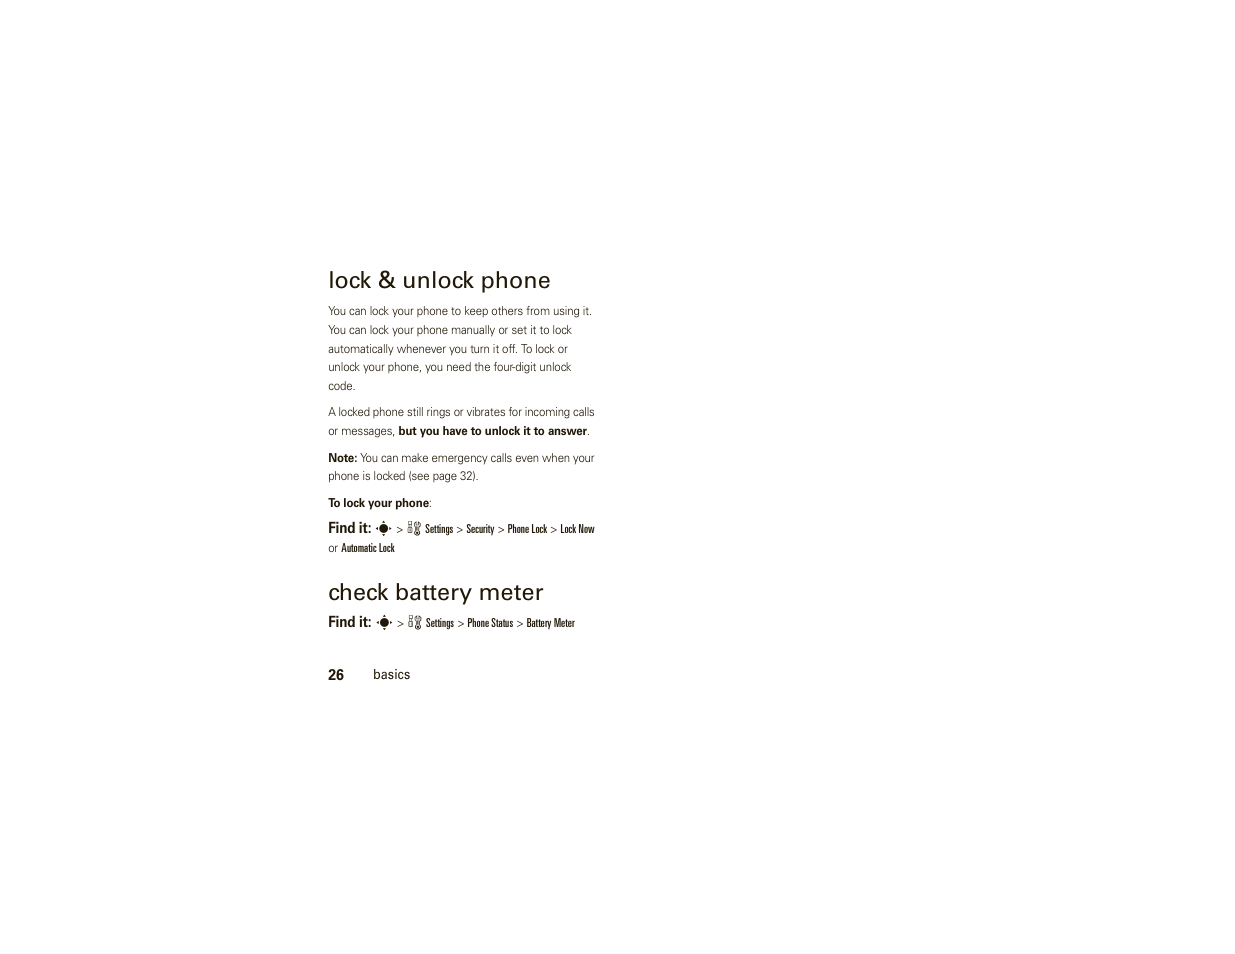 Lock & unlock phone, Check battery meter | Motorola W377G